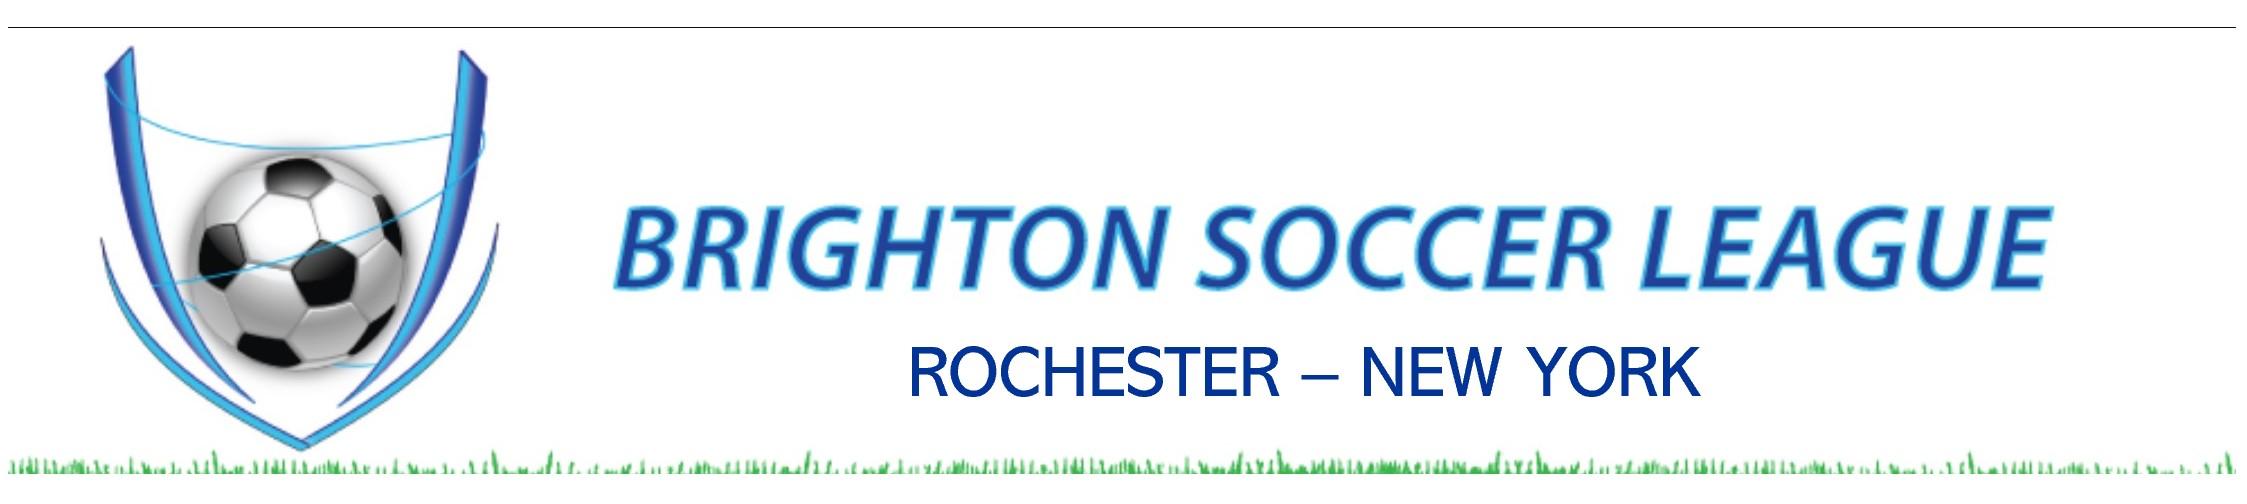 Brighton Soccer League, Soccer, Goal, Field